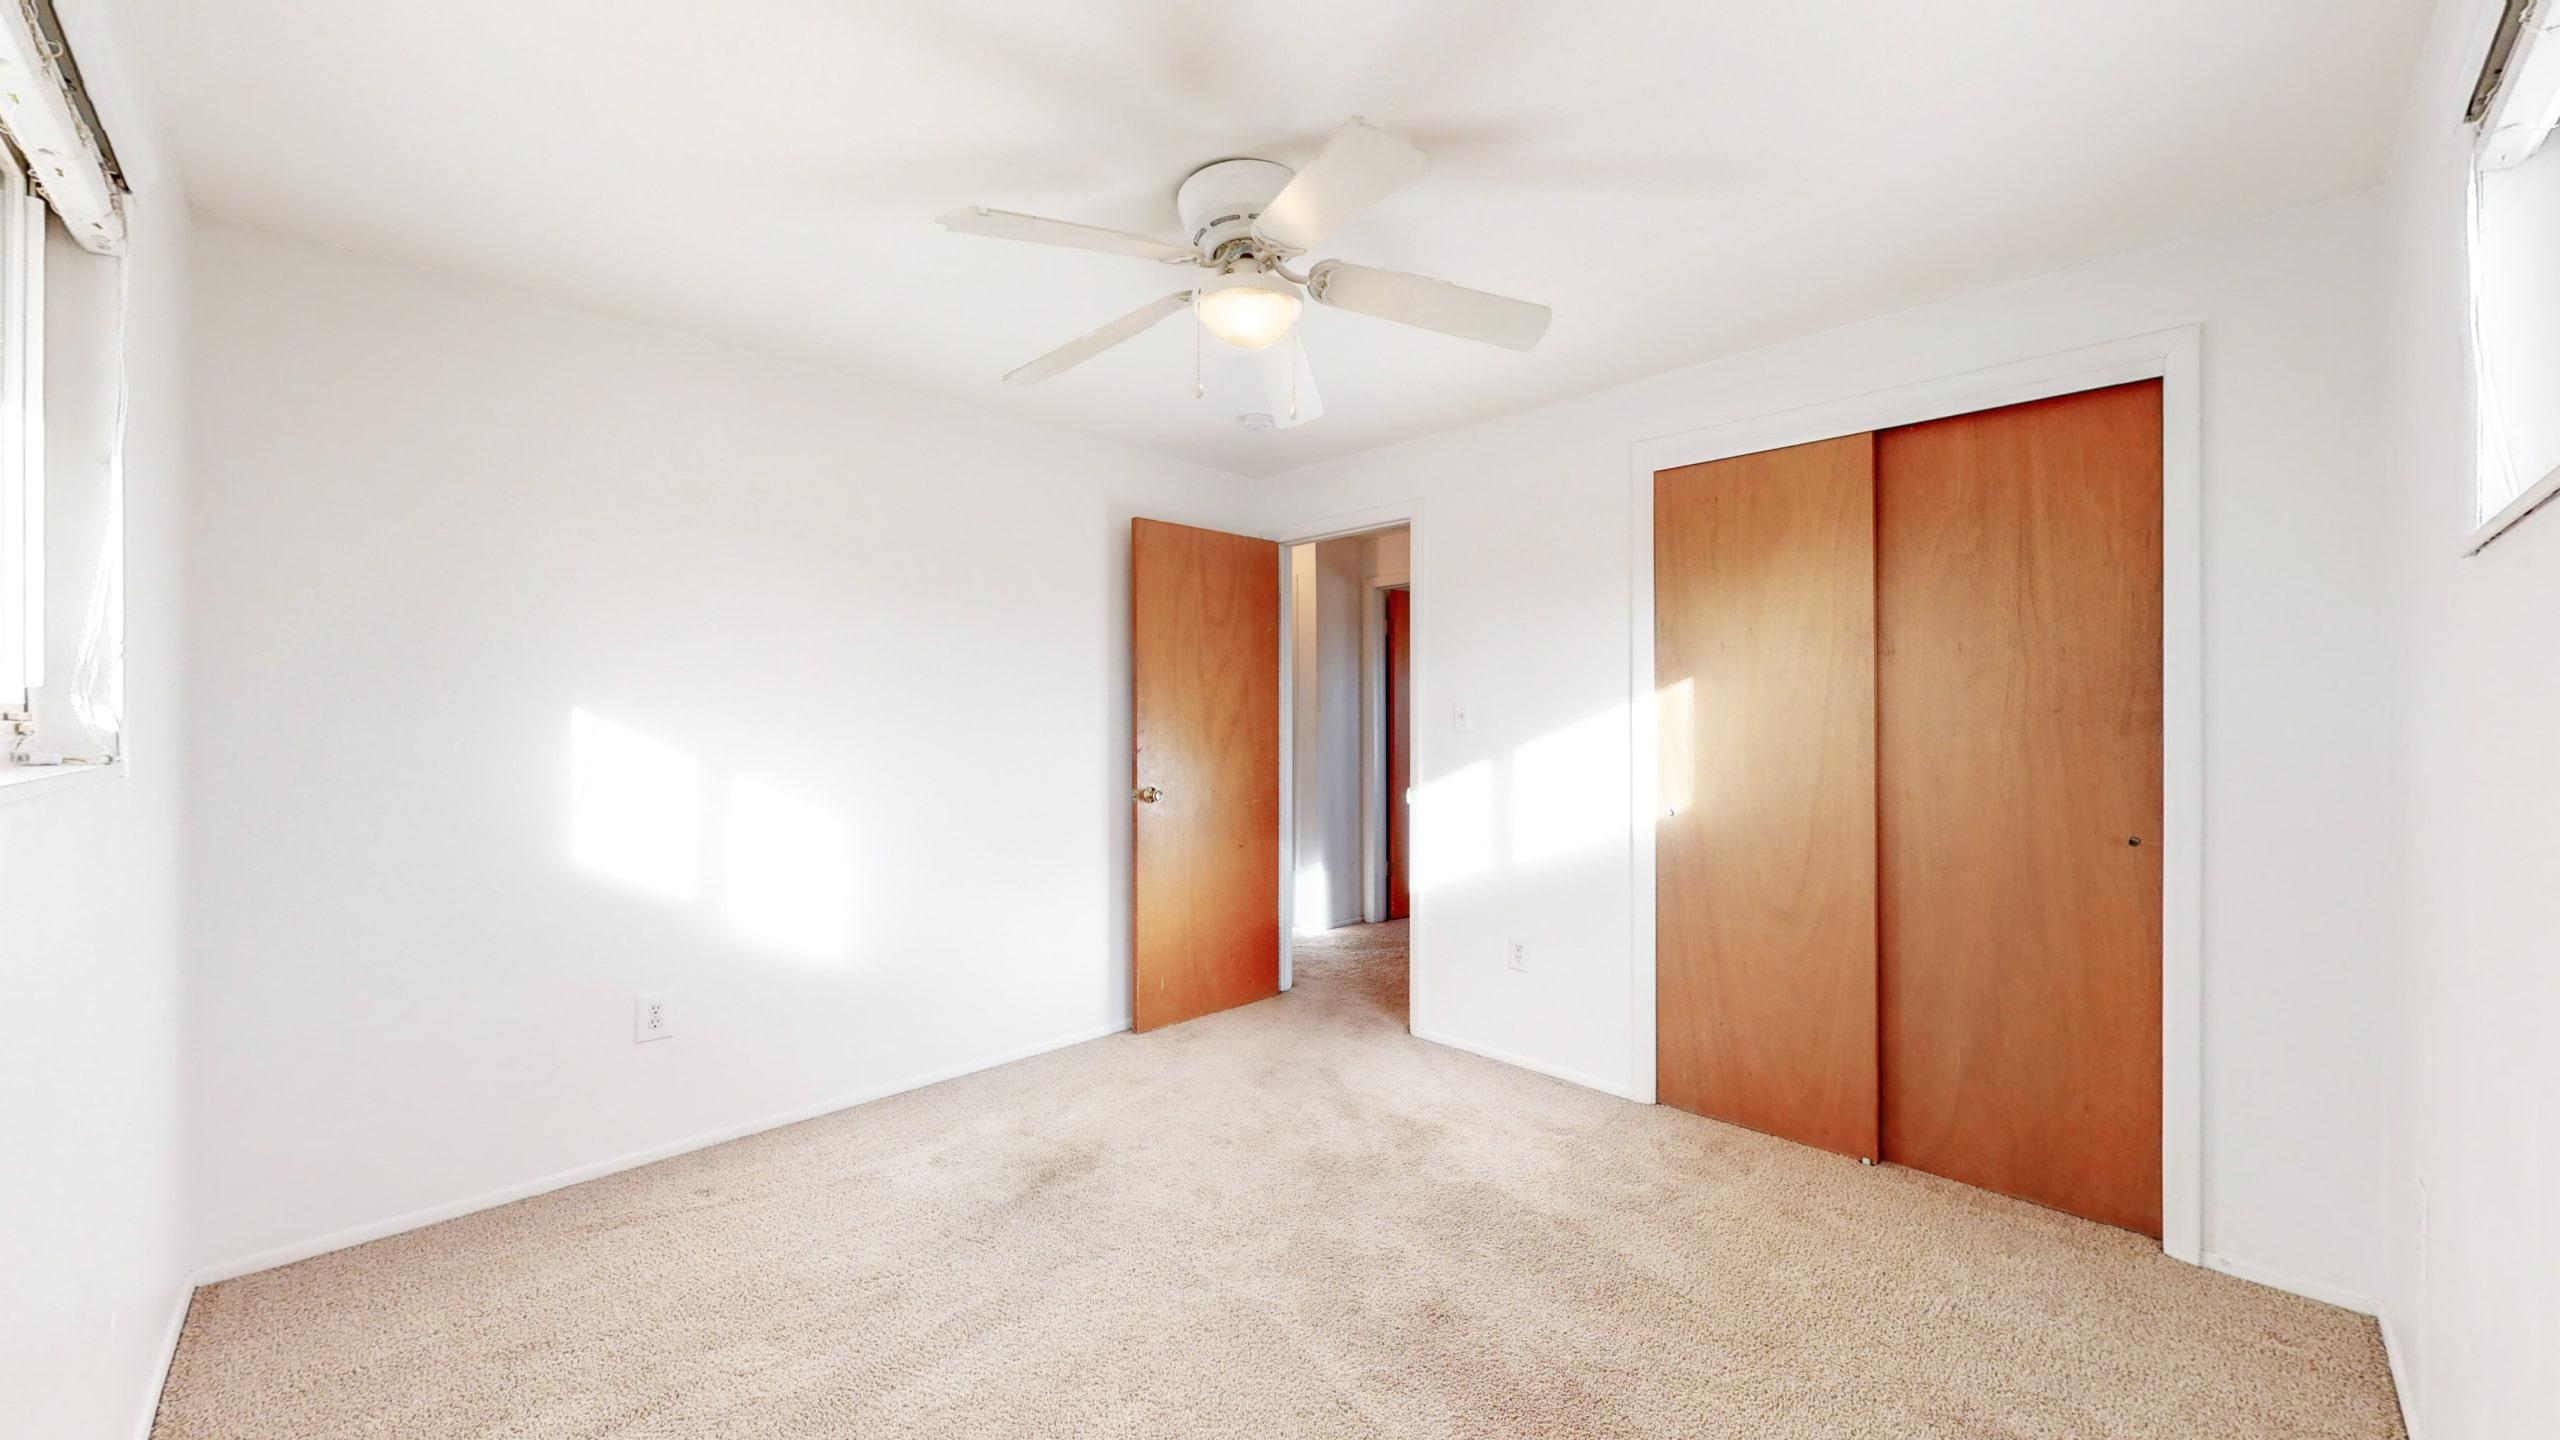 Medium Room, Brown Carpet, Closet With Wood Doors, Ceiling Fan